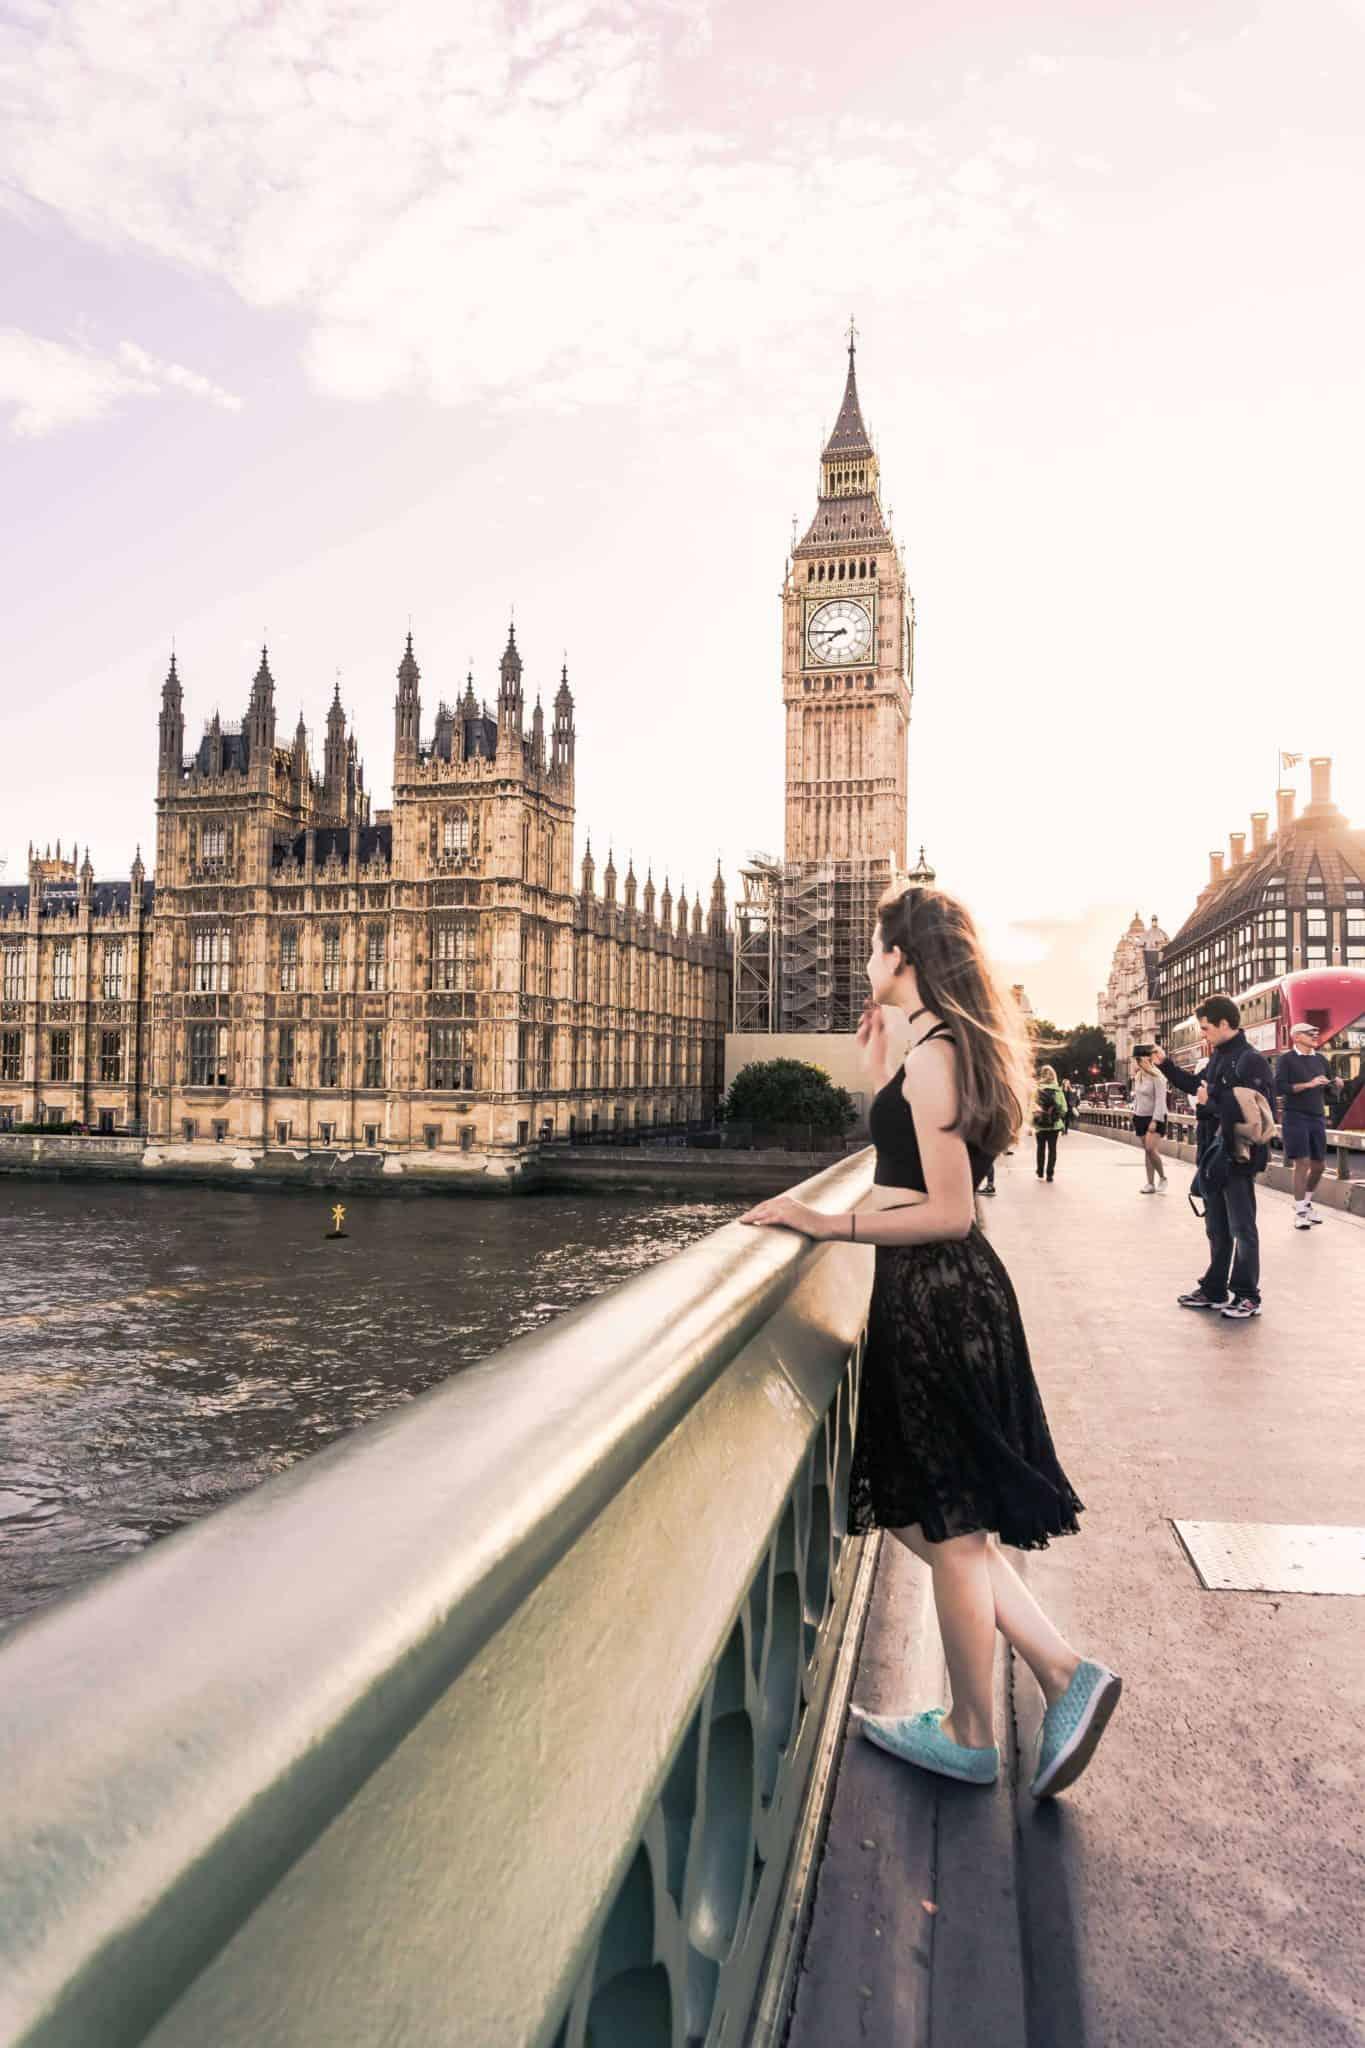 Big Ben: Three days in London guide